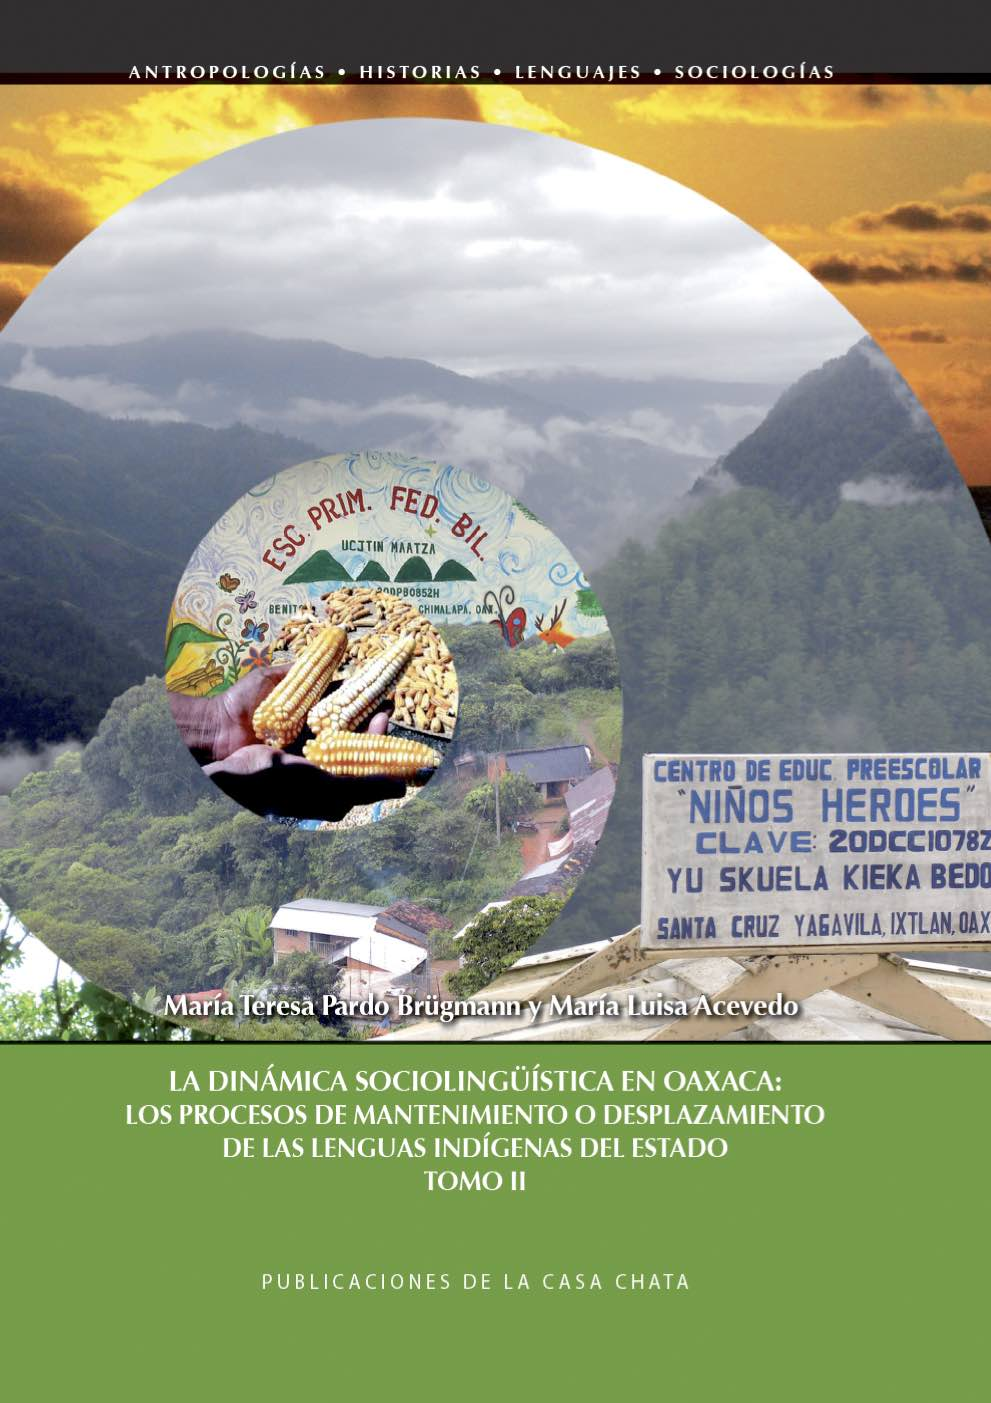 https://www.librosciesas.com/wp-content/uploads/2016/05/DinamicaII-Porta.jpg